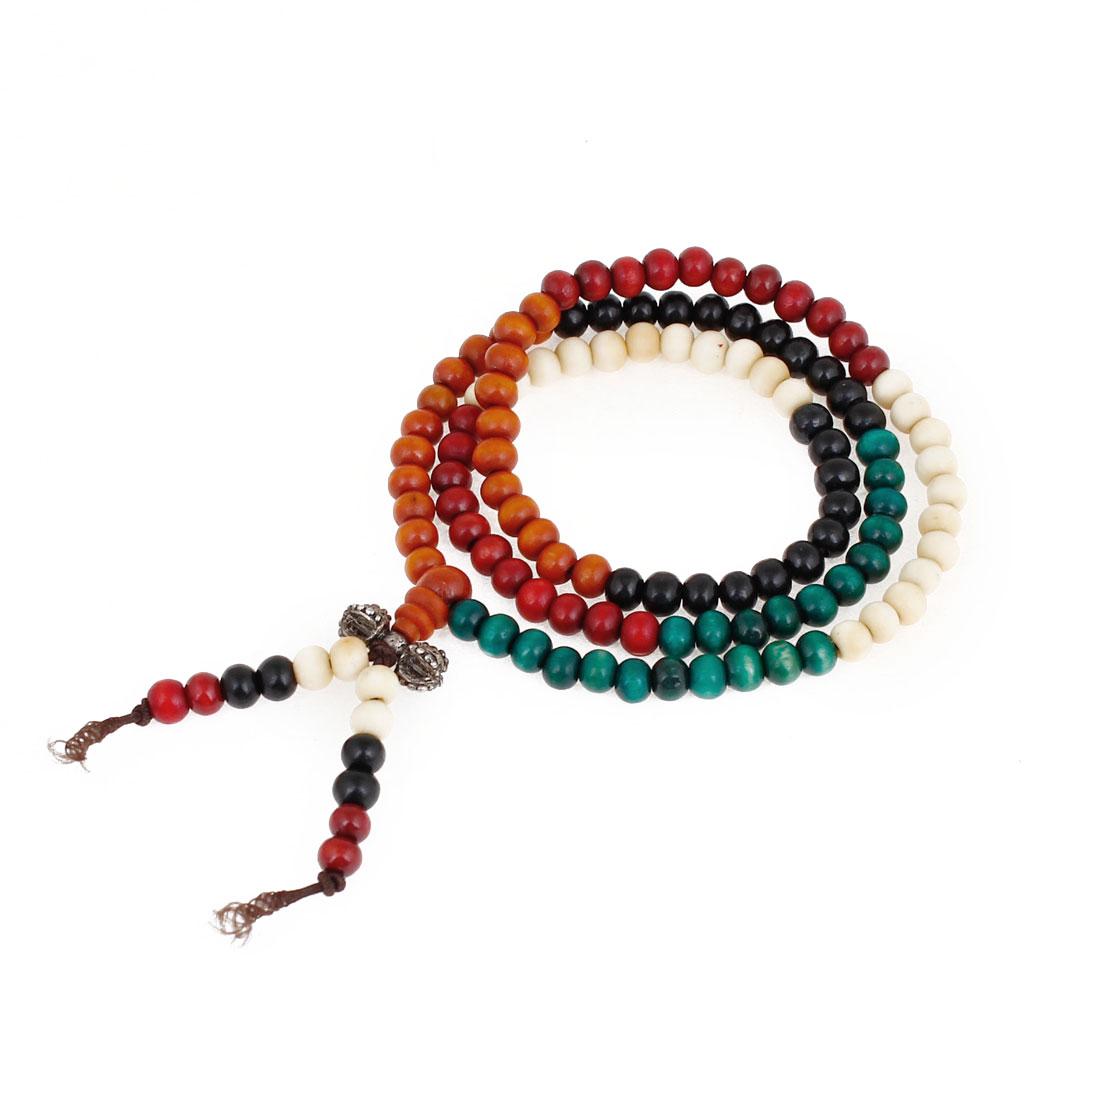 Adult Mulit Color Plastic Beads Elastic Hand Catenary Bracelet Decoration